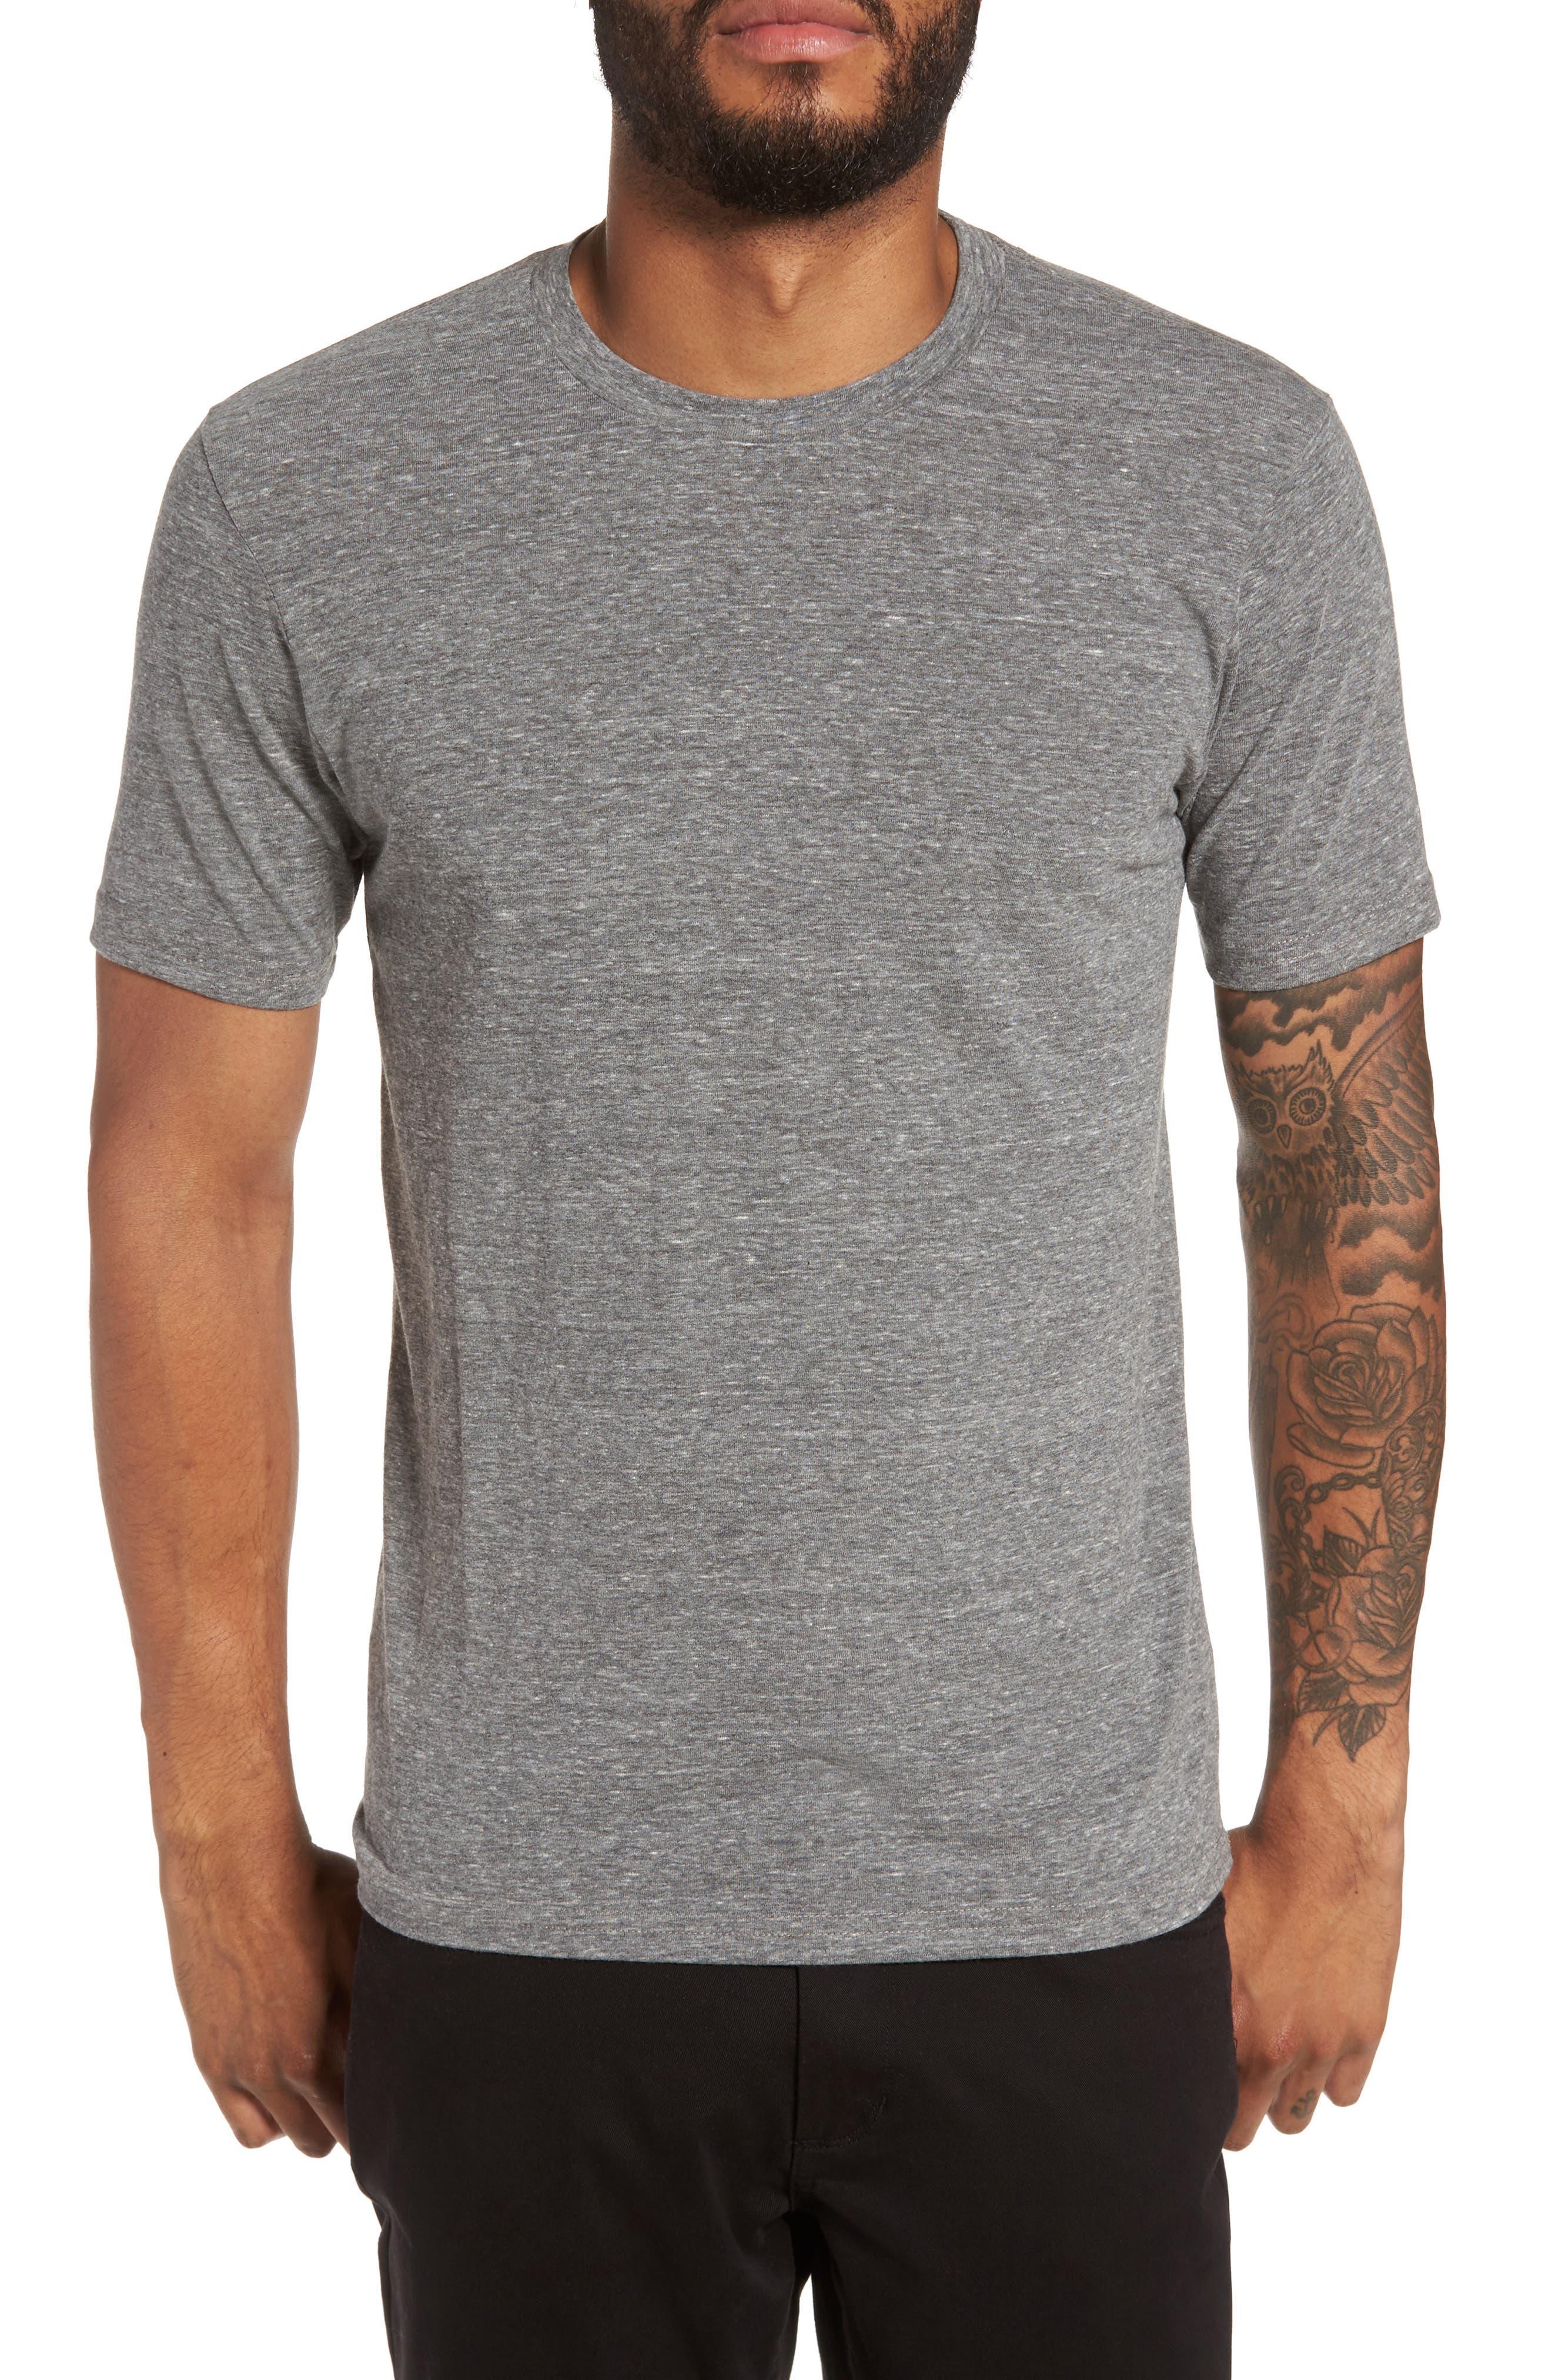 Supima Cotton Blend Crewneck T-Shirt,                             Main thumbnail 1, color,                             HEATHER GREY